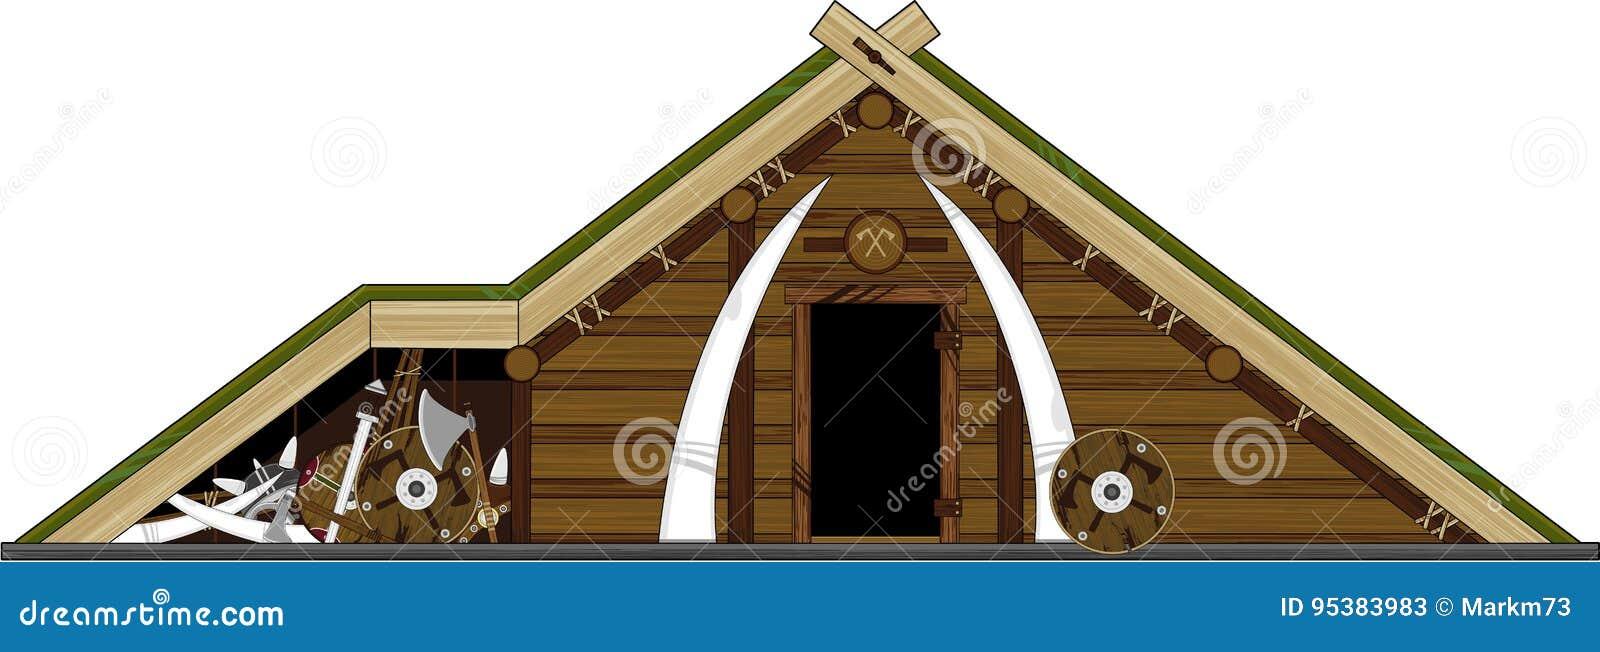 cartoon viking home stock vector illustration of homes 95383983